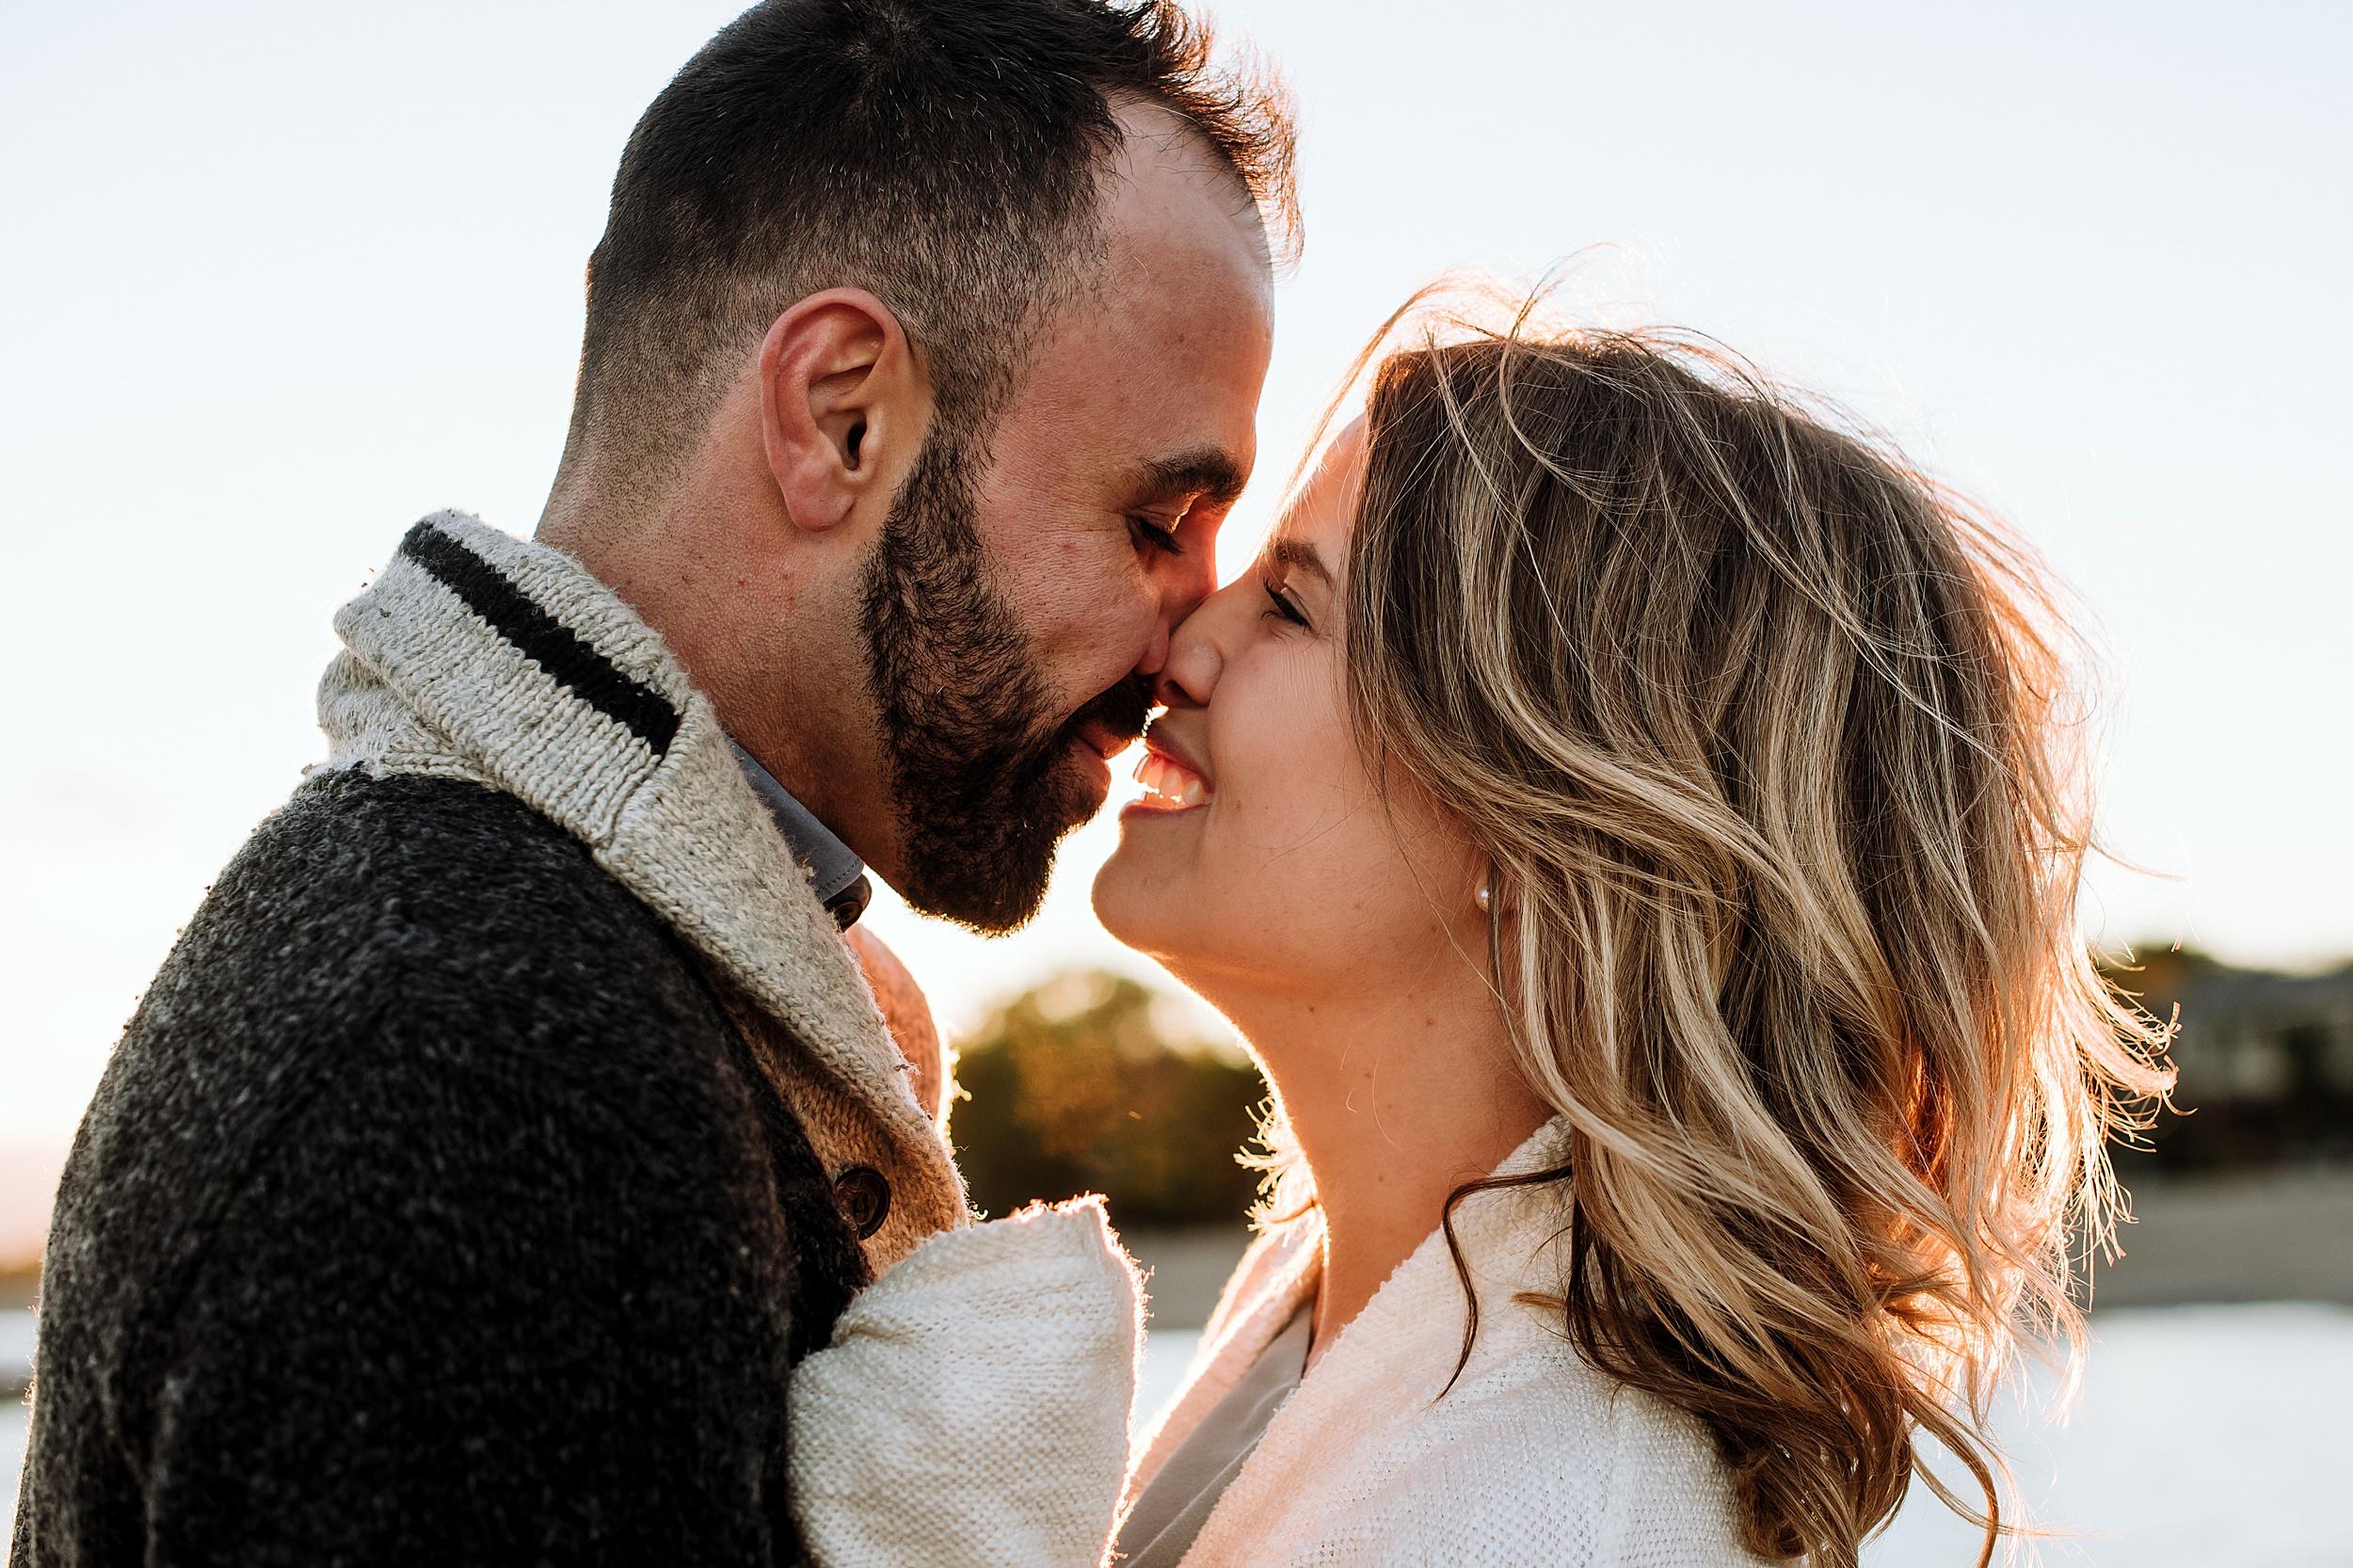 Toronto_Wedding_Photographers_Engagement_Shoot_The_Beaches_011.jpg